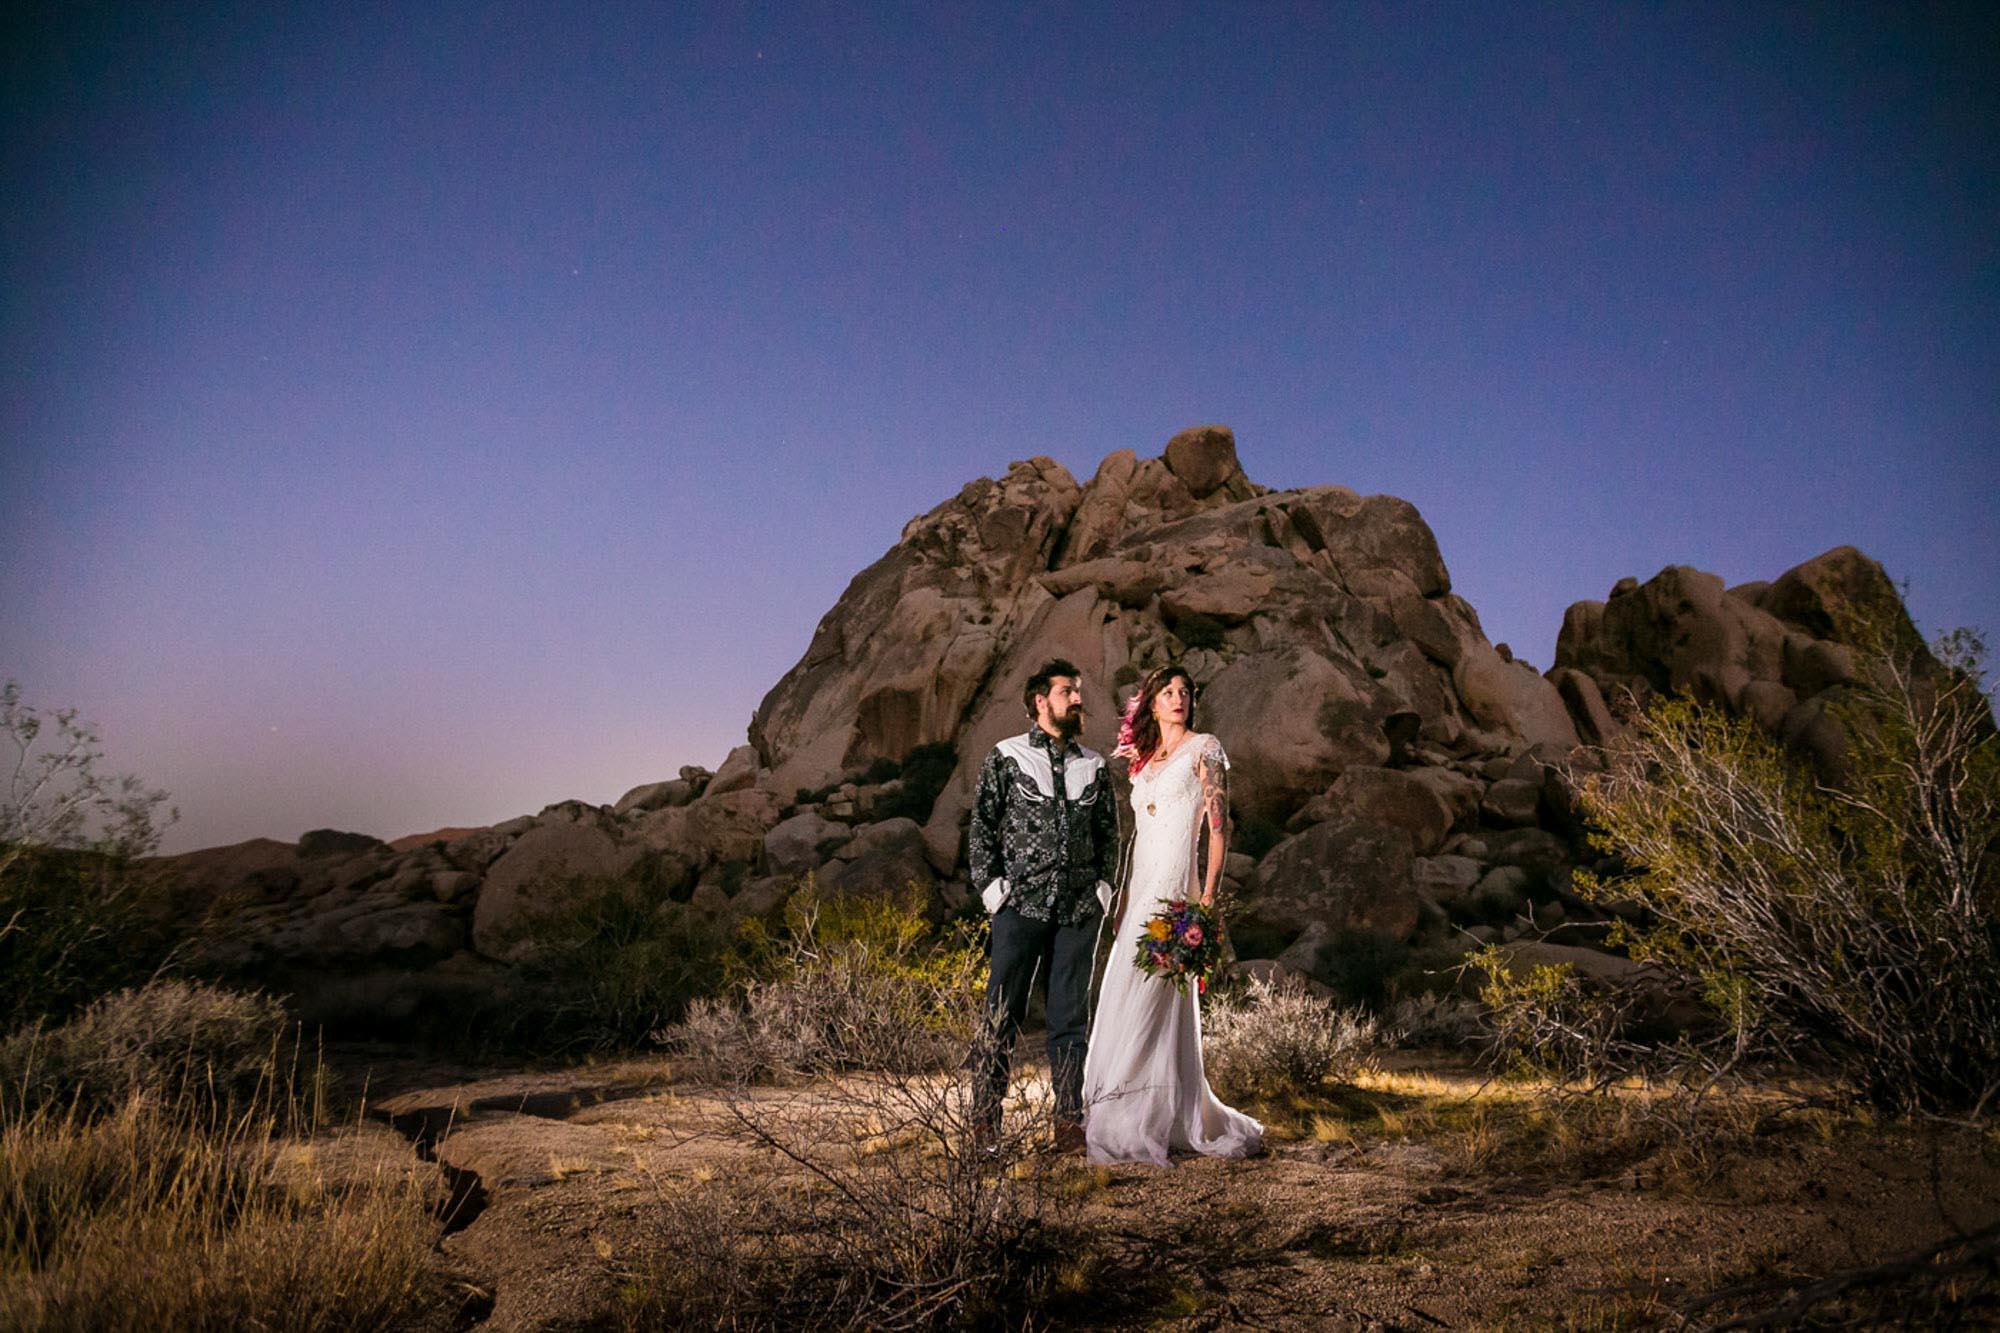 DS-Laguna-Beach-Engagement-Photography-Sarah-Mack-Photo -0013.jpg